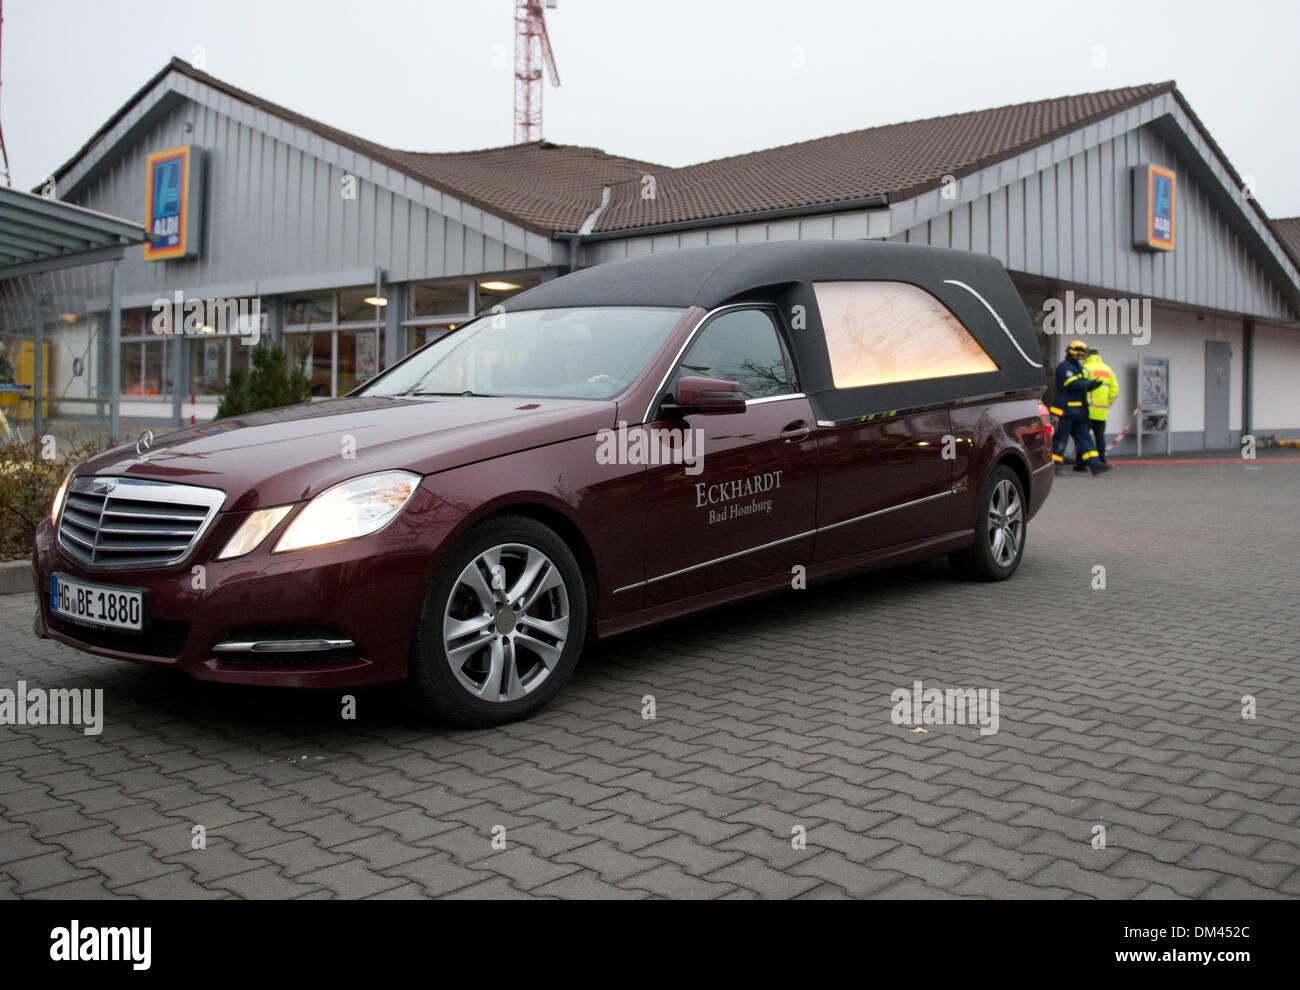 Bad Homburg, Germany  11th Dec, 2013  A funeral car is